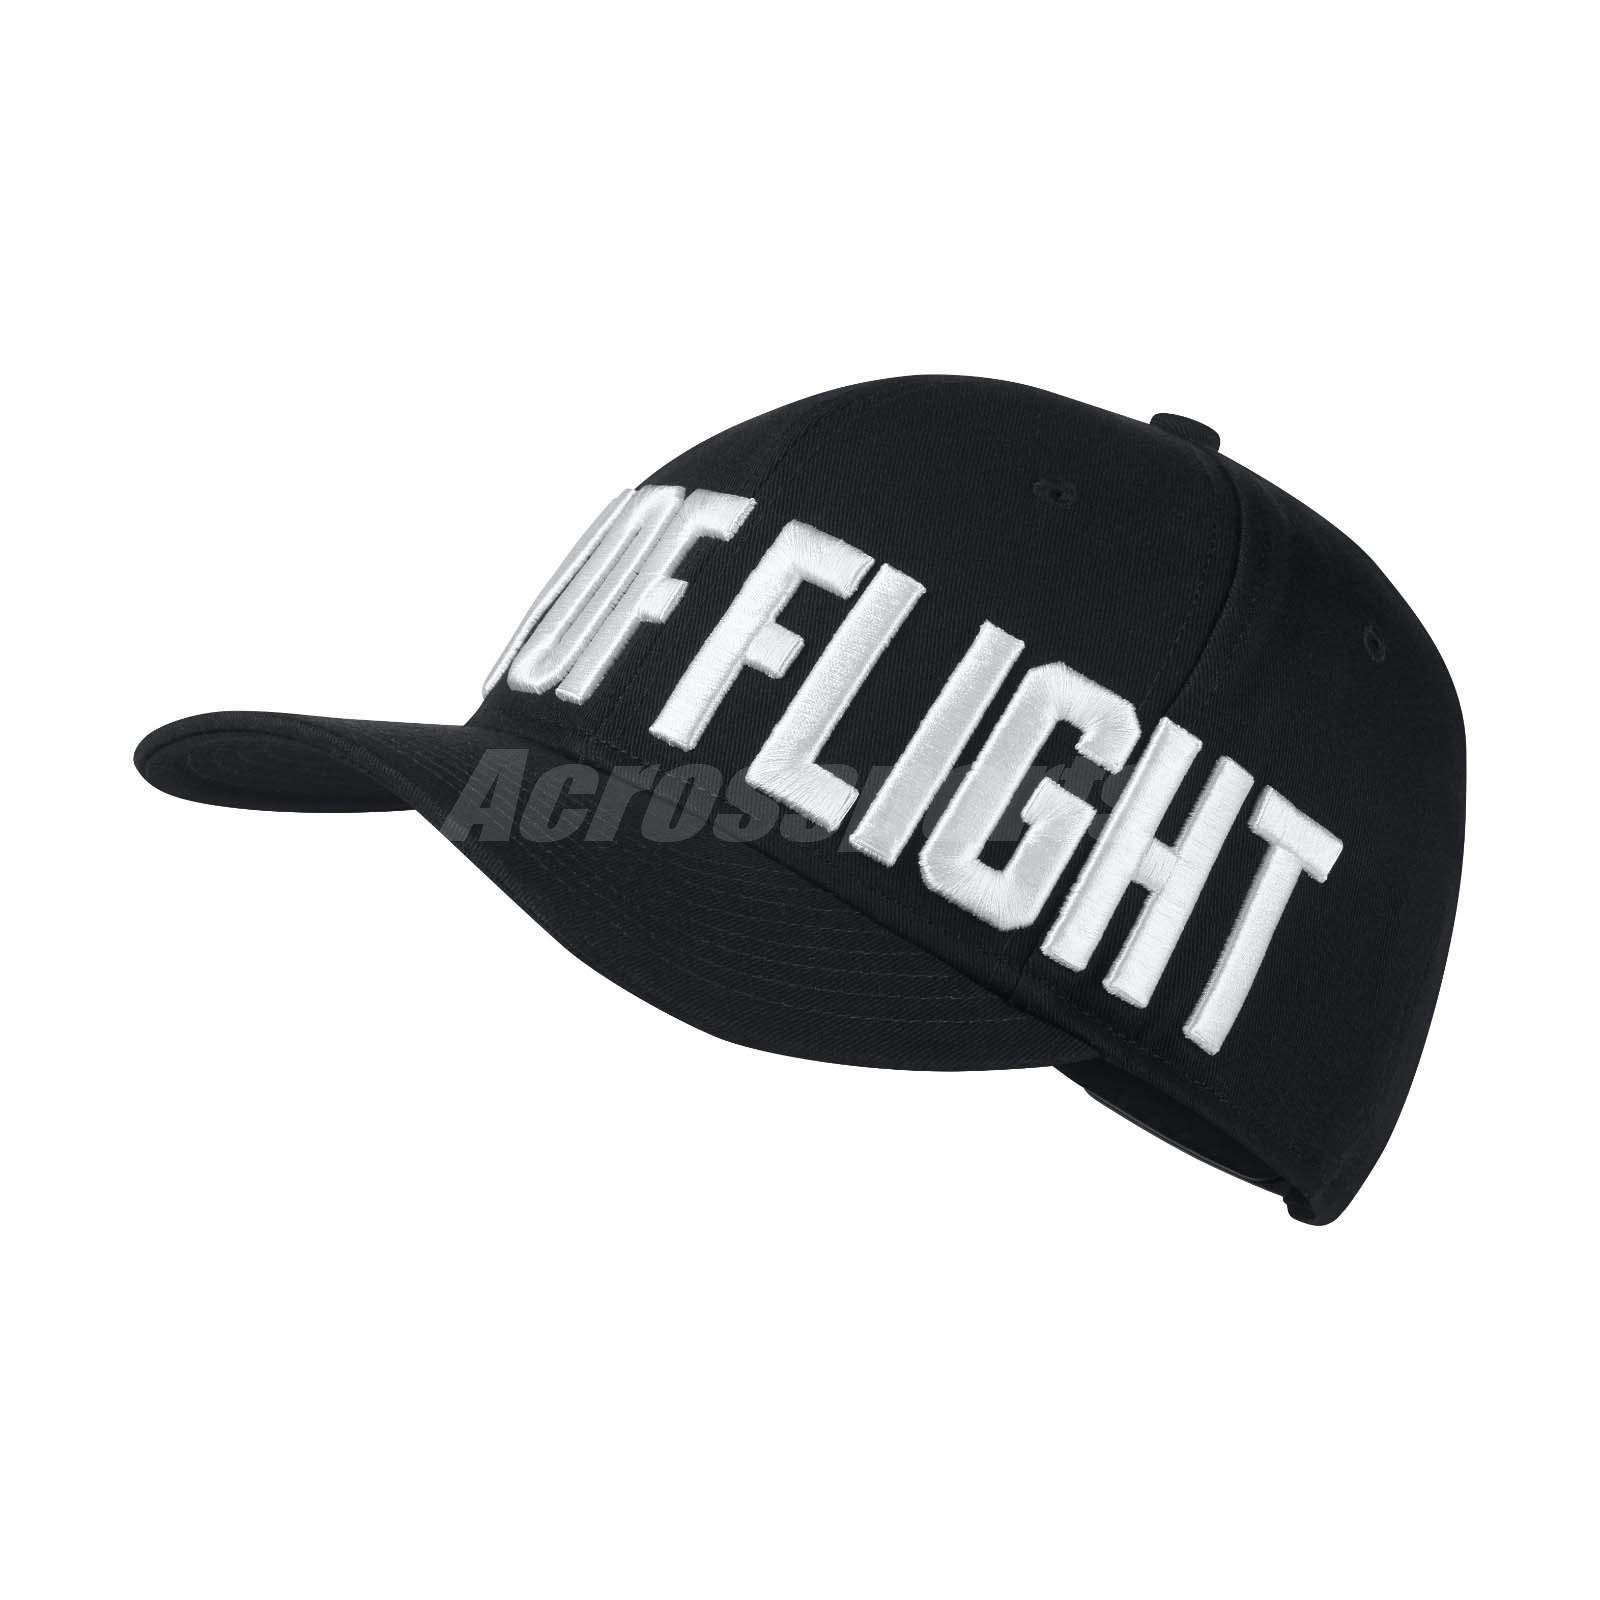 0844def5ce8 Details about Nike Unisex Air Jordan Jumpman Classic 99 City of Flight Cap  Black 894675-010